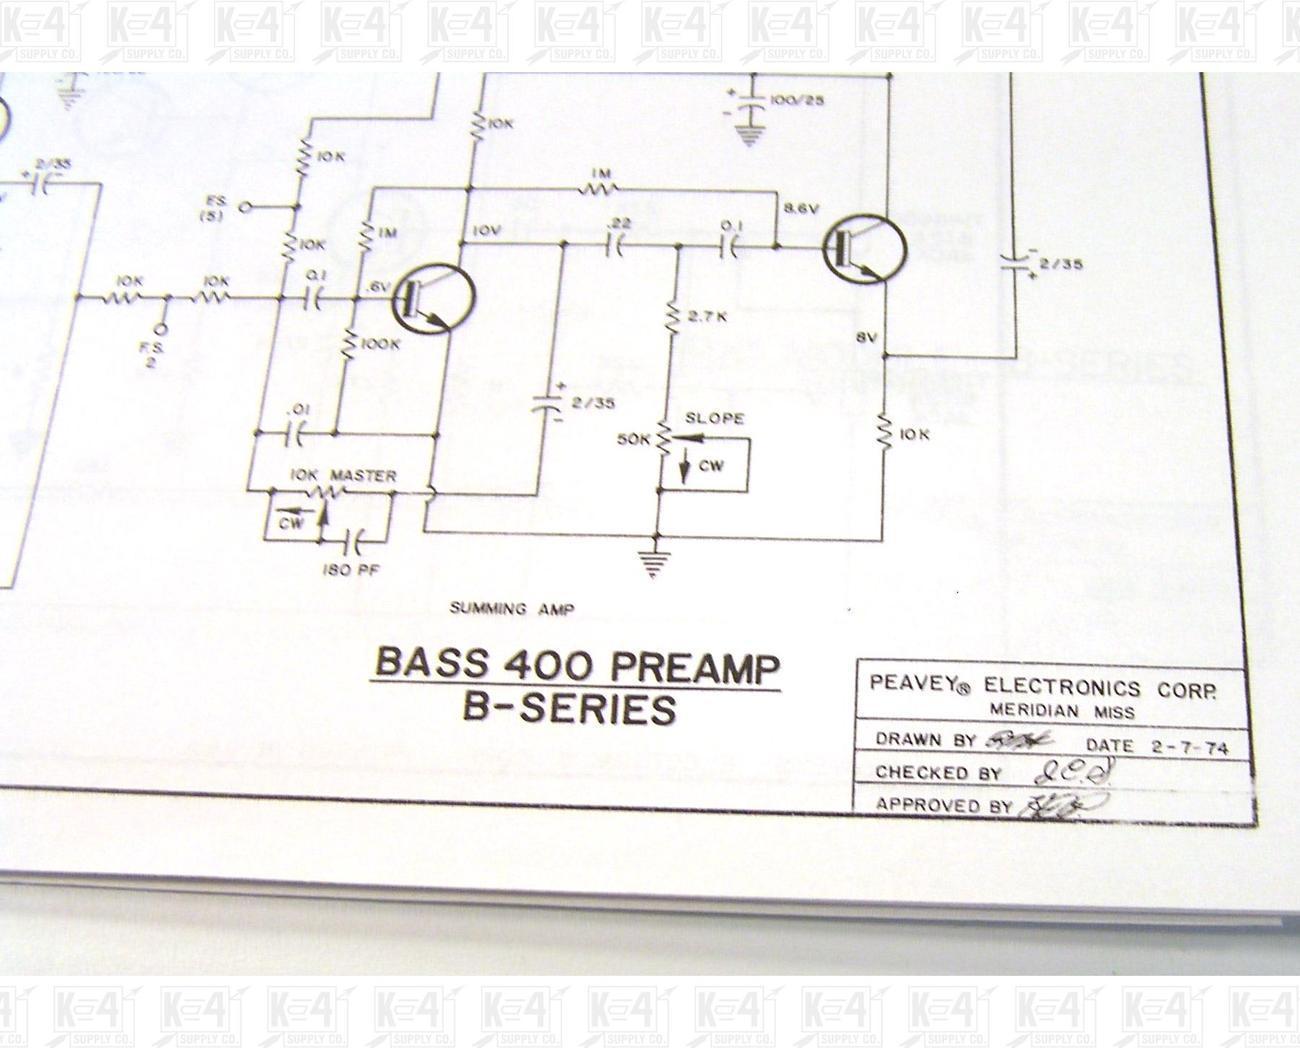 Mixer Wiring Diagram Ibanez Bass Guitar Wire Data Schema Grg Peavey Cs 800 Parts Elsavadorla Controls On An Sdgr 4 String